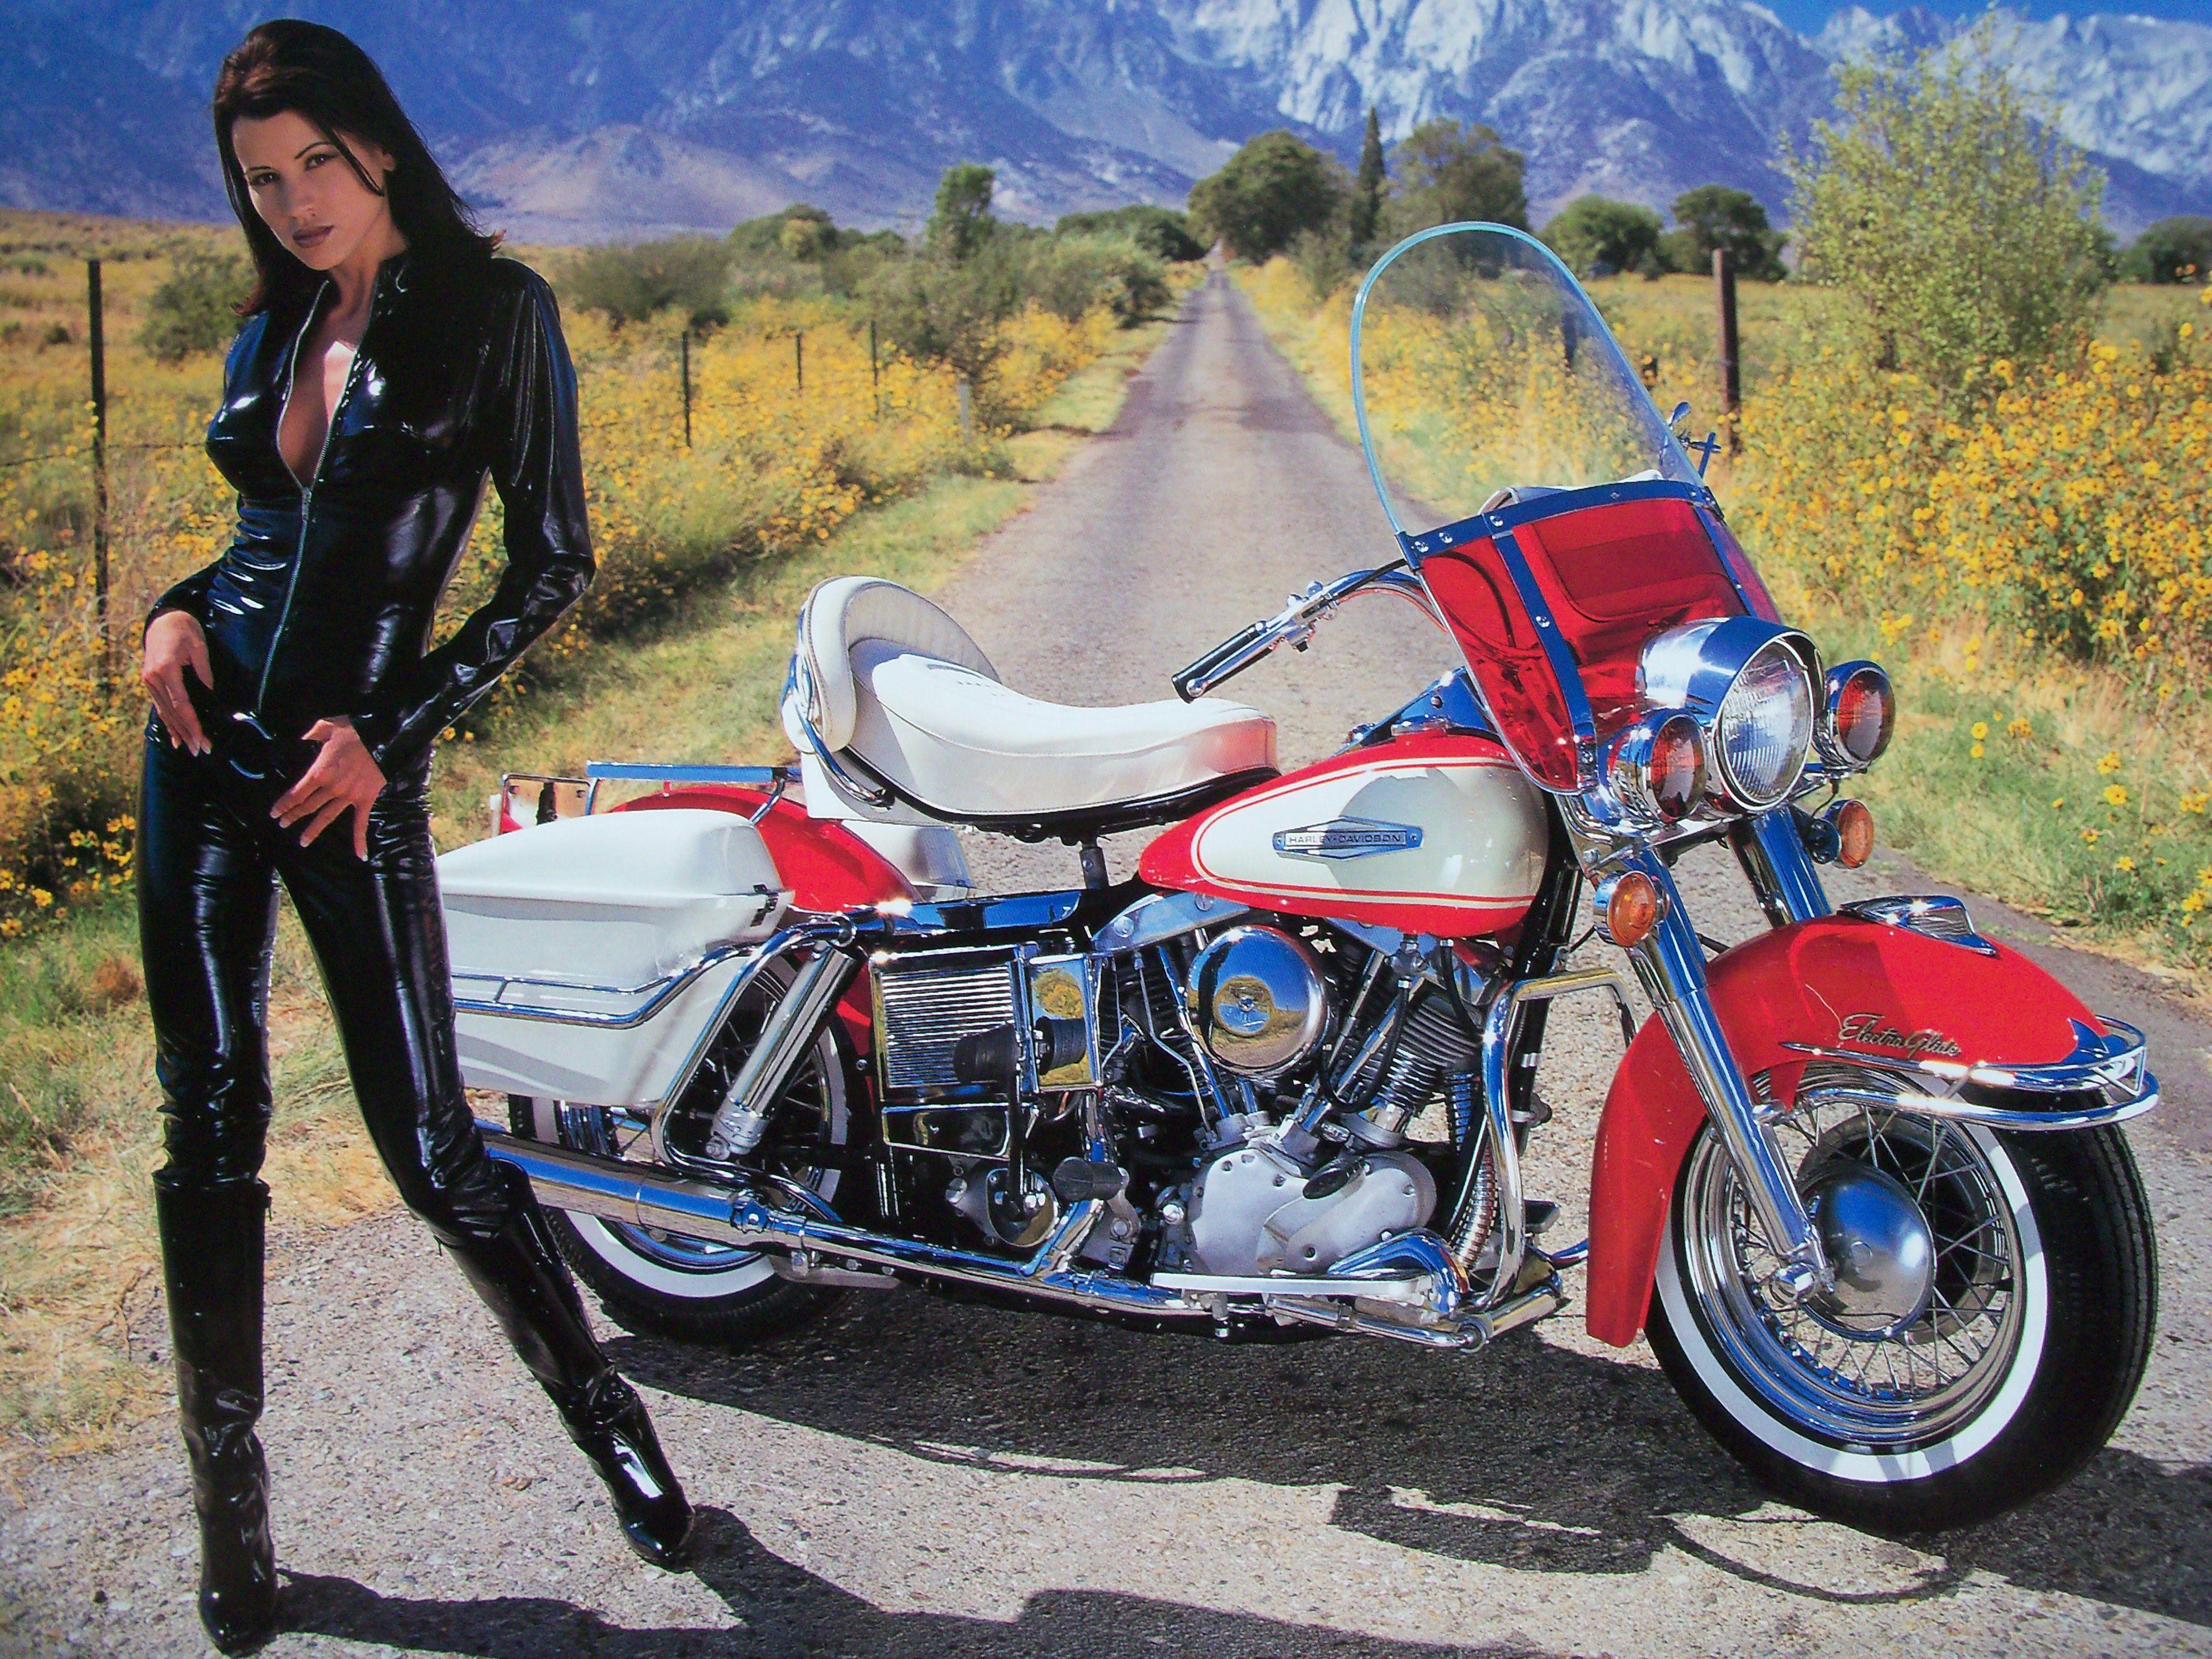 hight resolution of women motorcycle 1966 harley davidson flh electra glide davidson flh girl harley